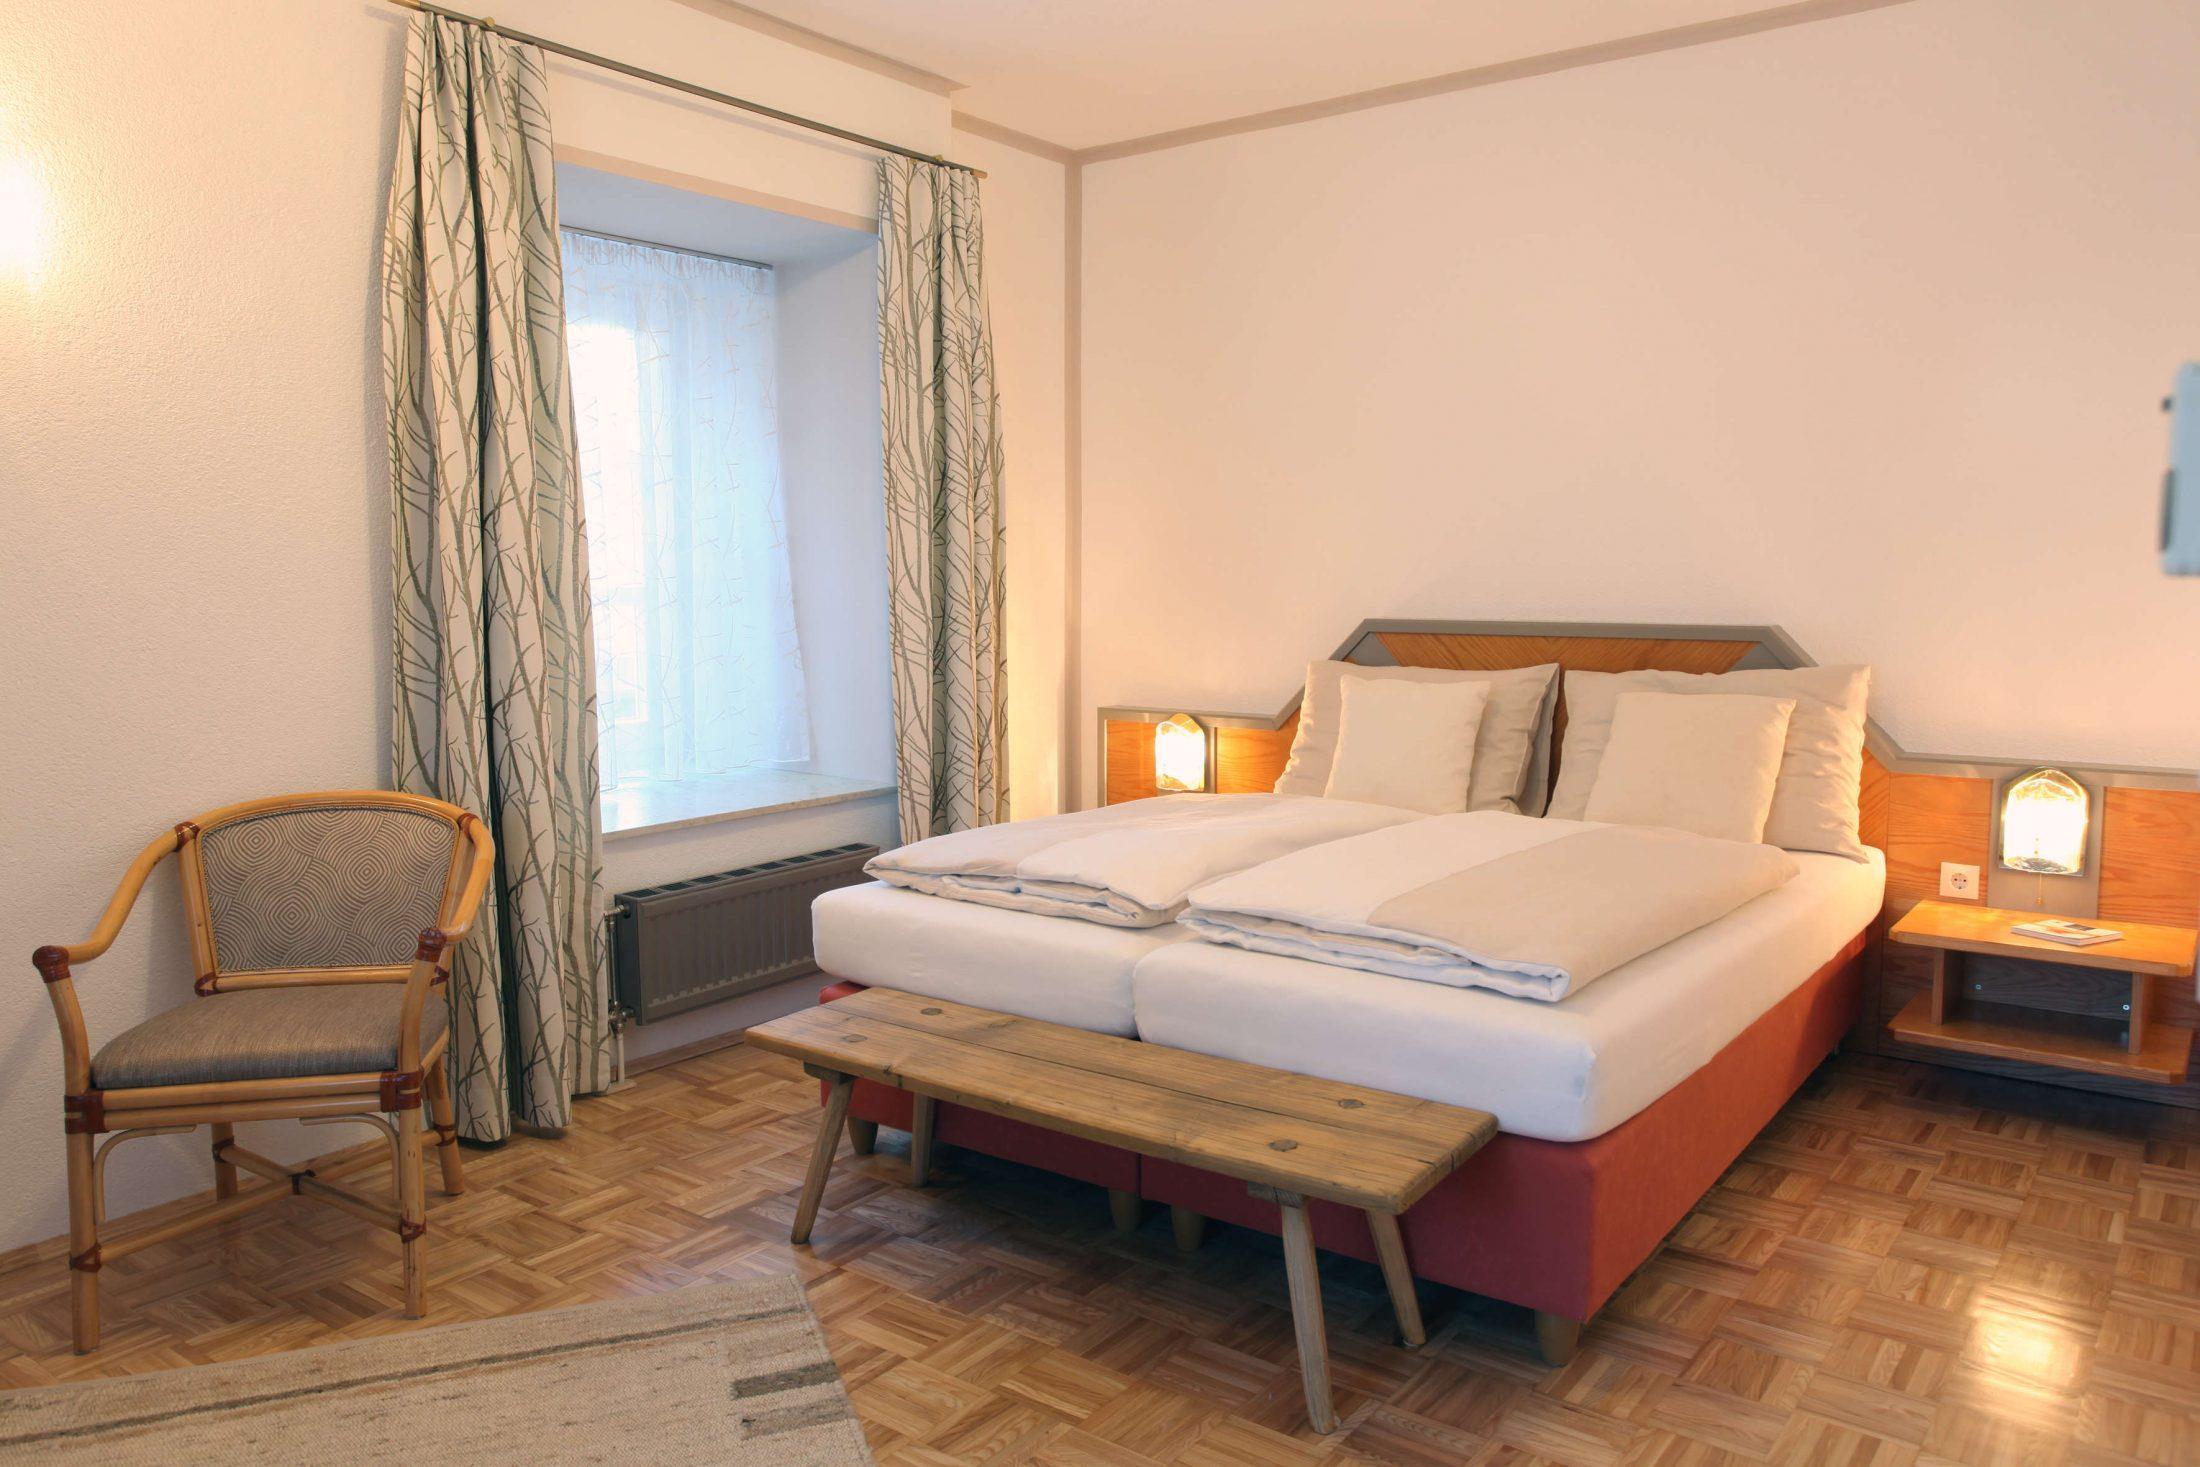 Hotelzimmer mit Doppelbett, rustikale Bank